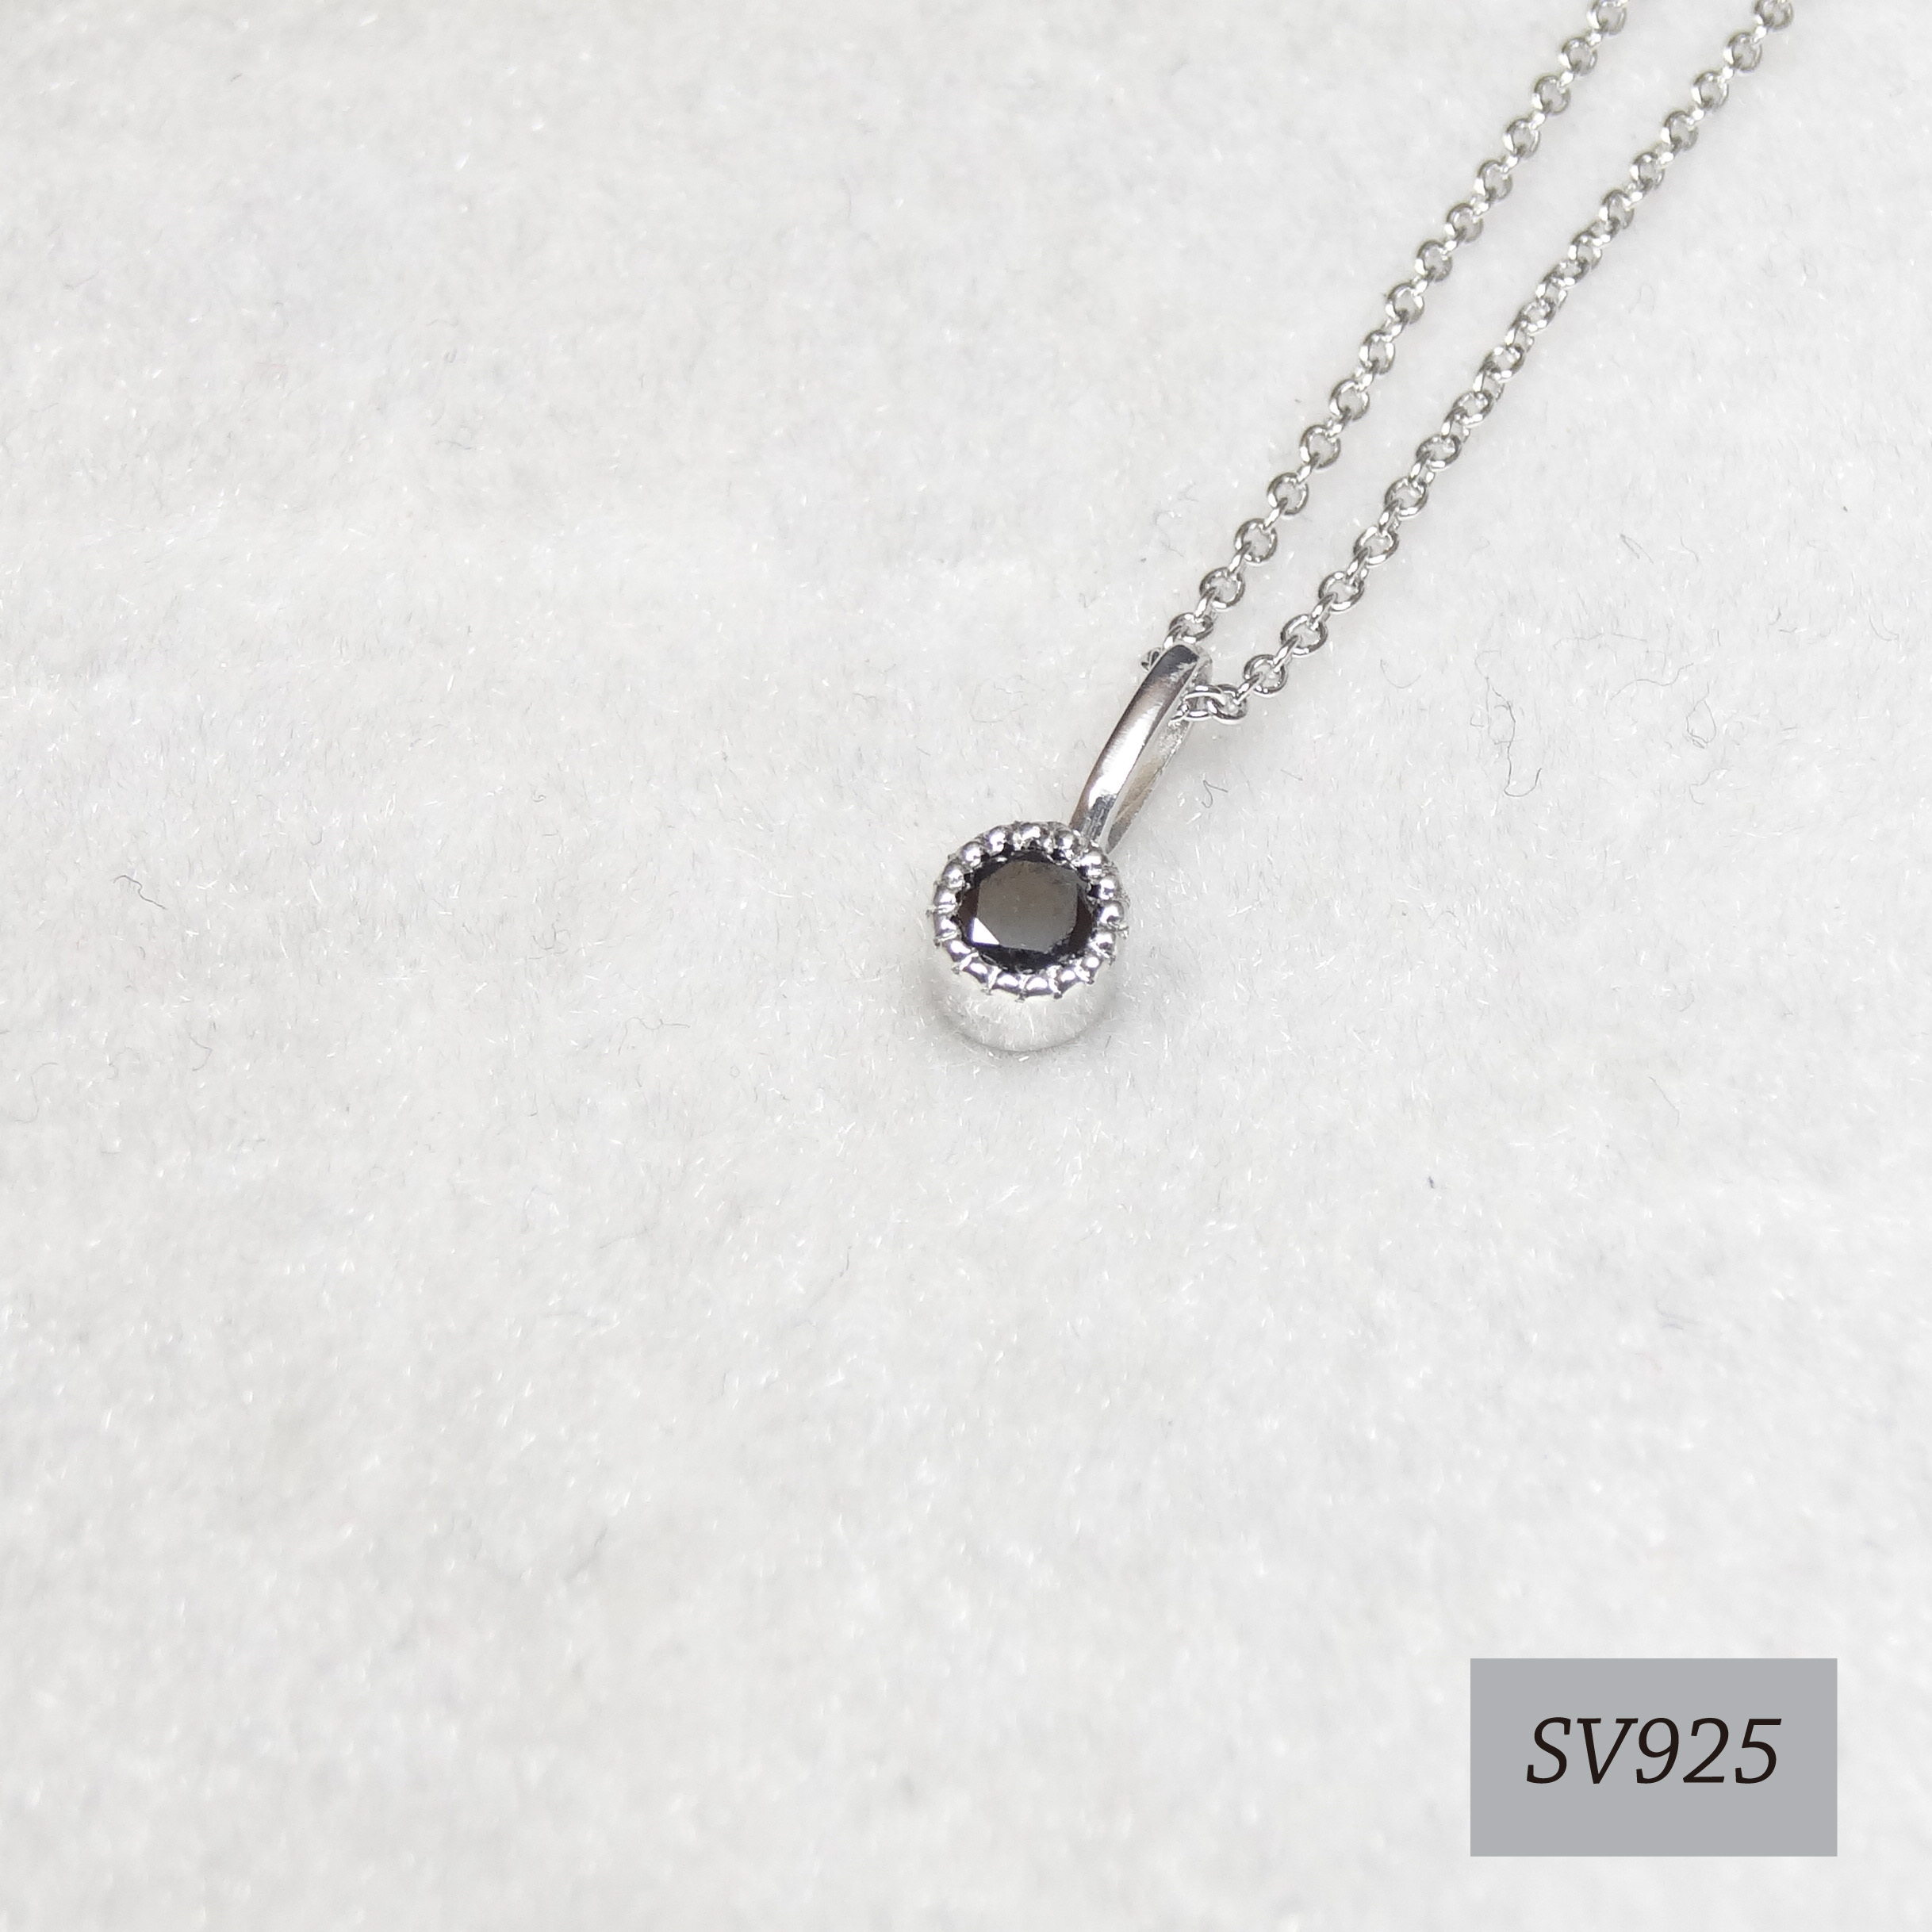 SVミルネック  ブラックダイヤモンド♡永遠の絆/邪気払い/人間関係/カリスマ性♡